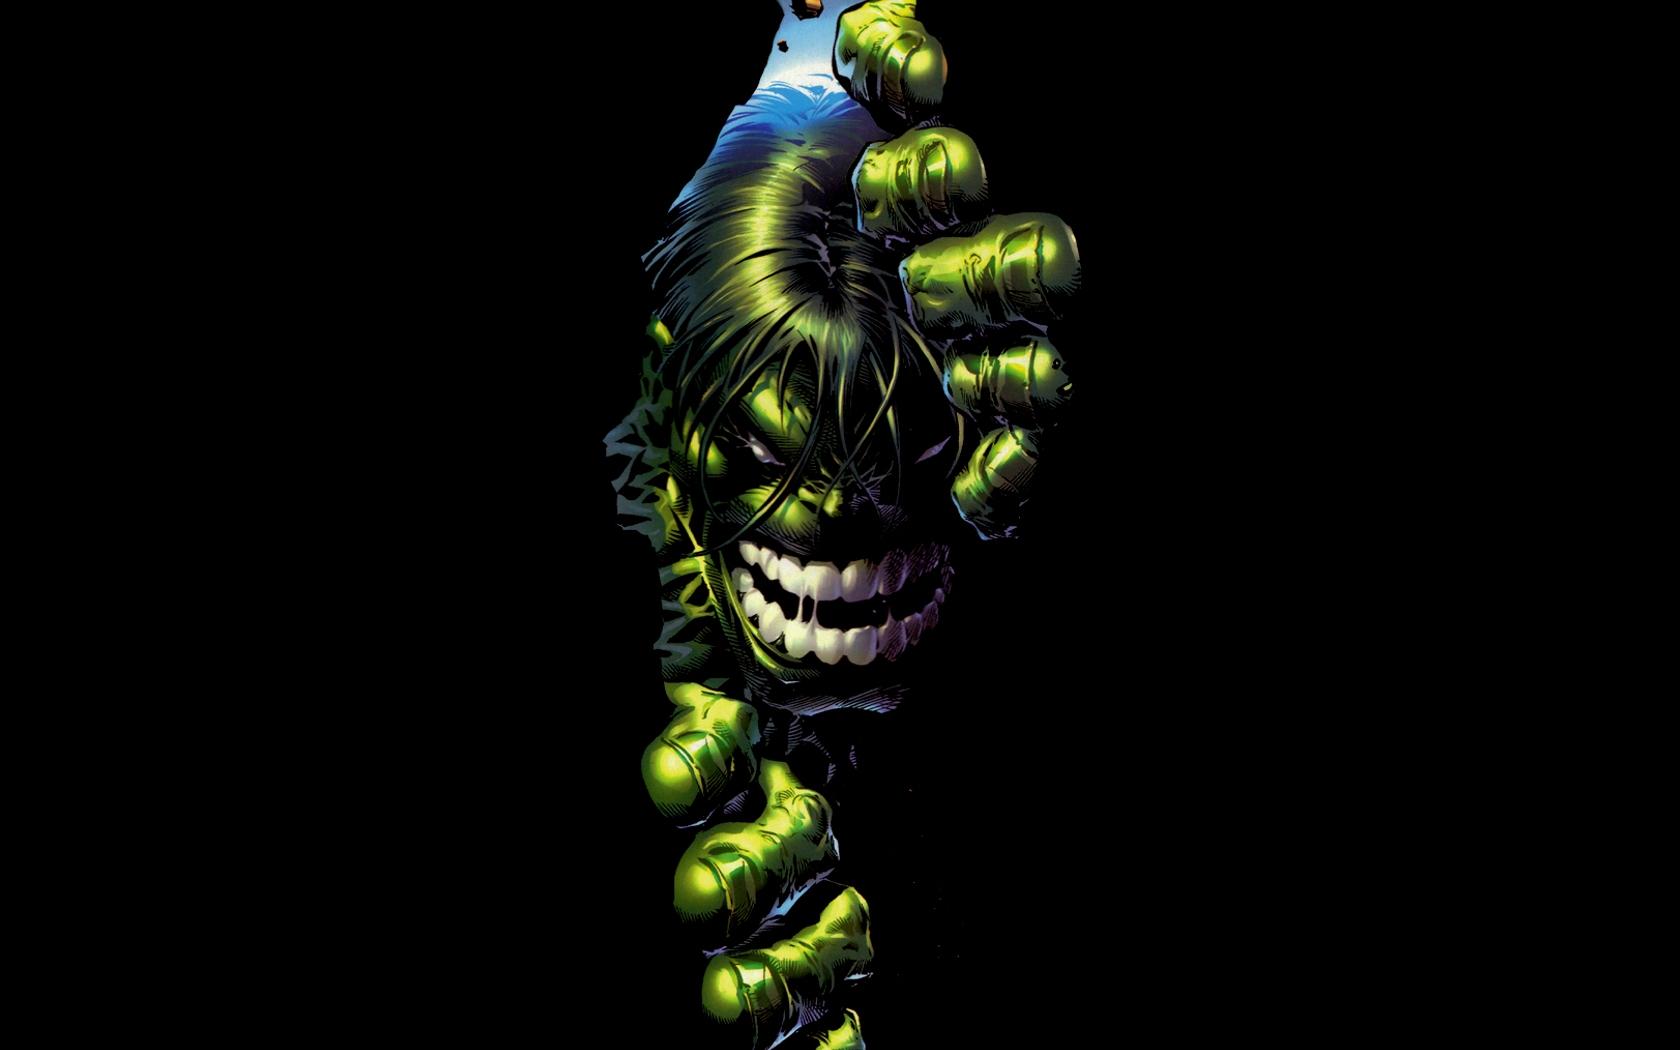 Hulk comics marvel comics wallpaper 1680x1050 58608 wallpaperup voltagebd Choice Image